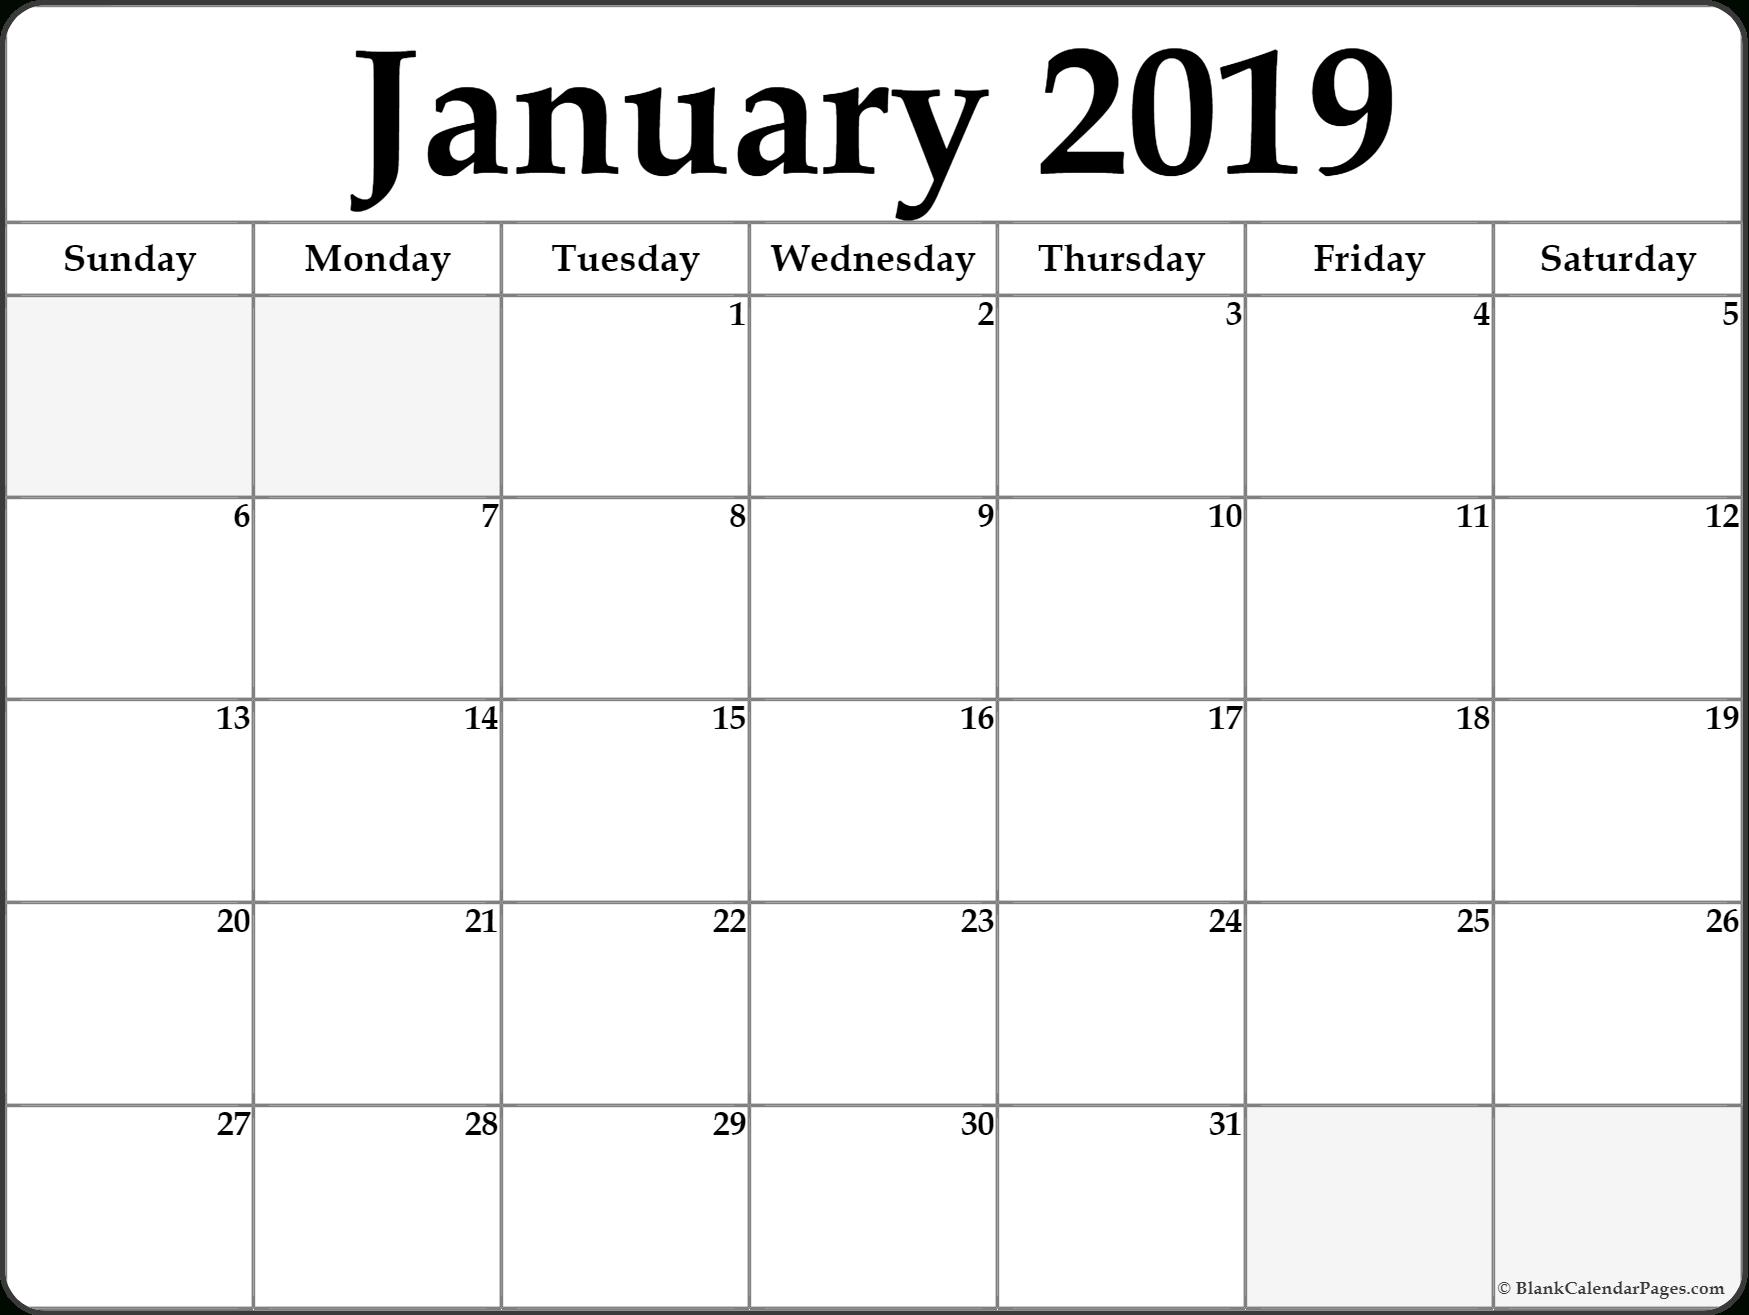 Free Printable Monthly Calendar January 2019 Pdf Calendar 2019 January Pdf